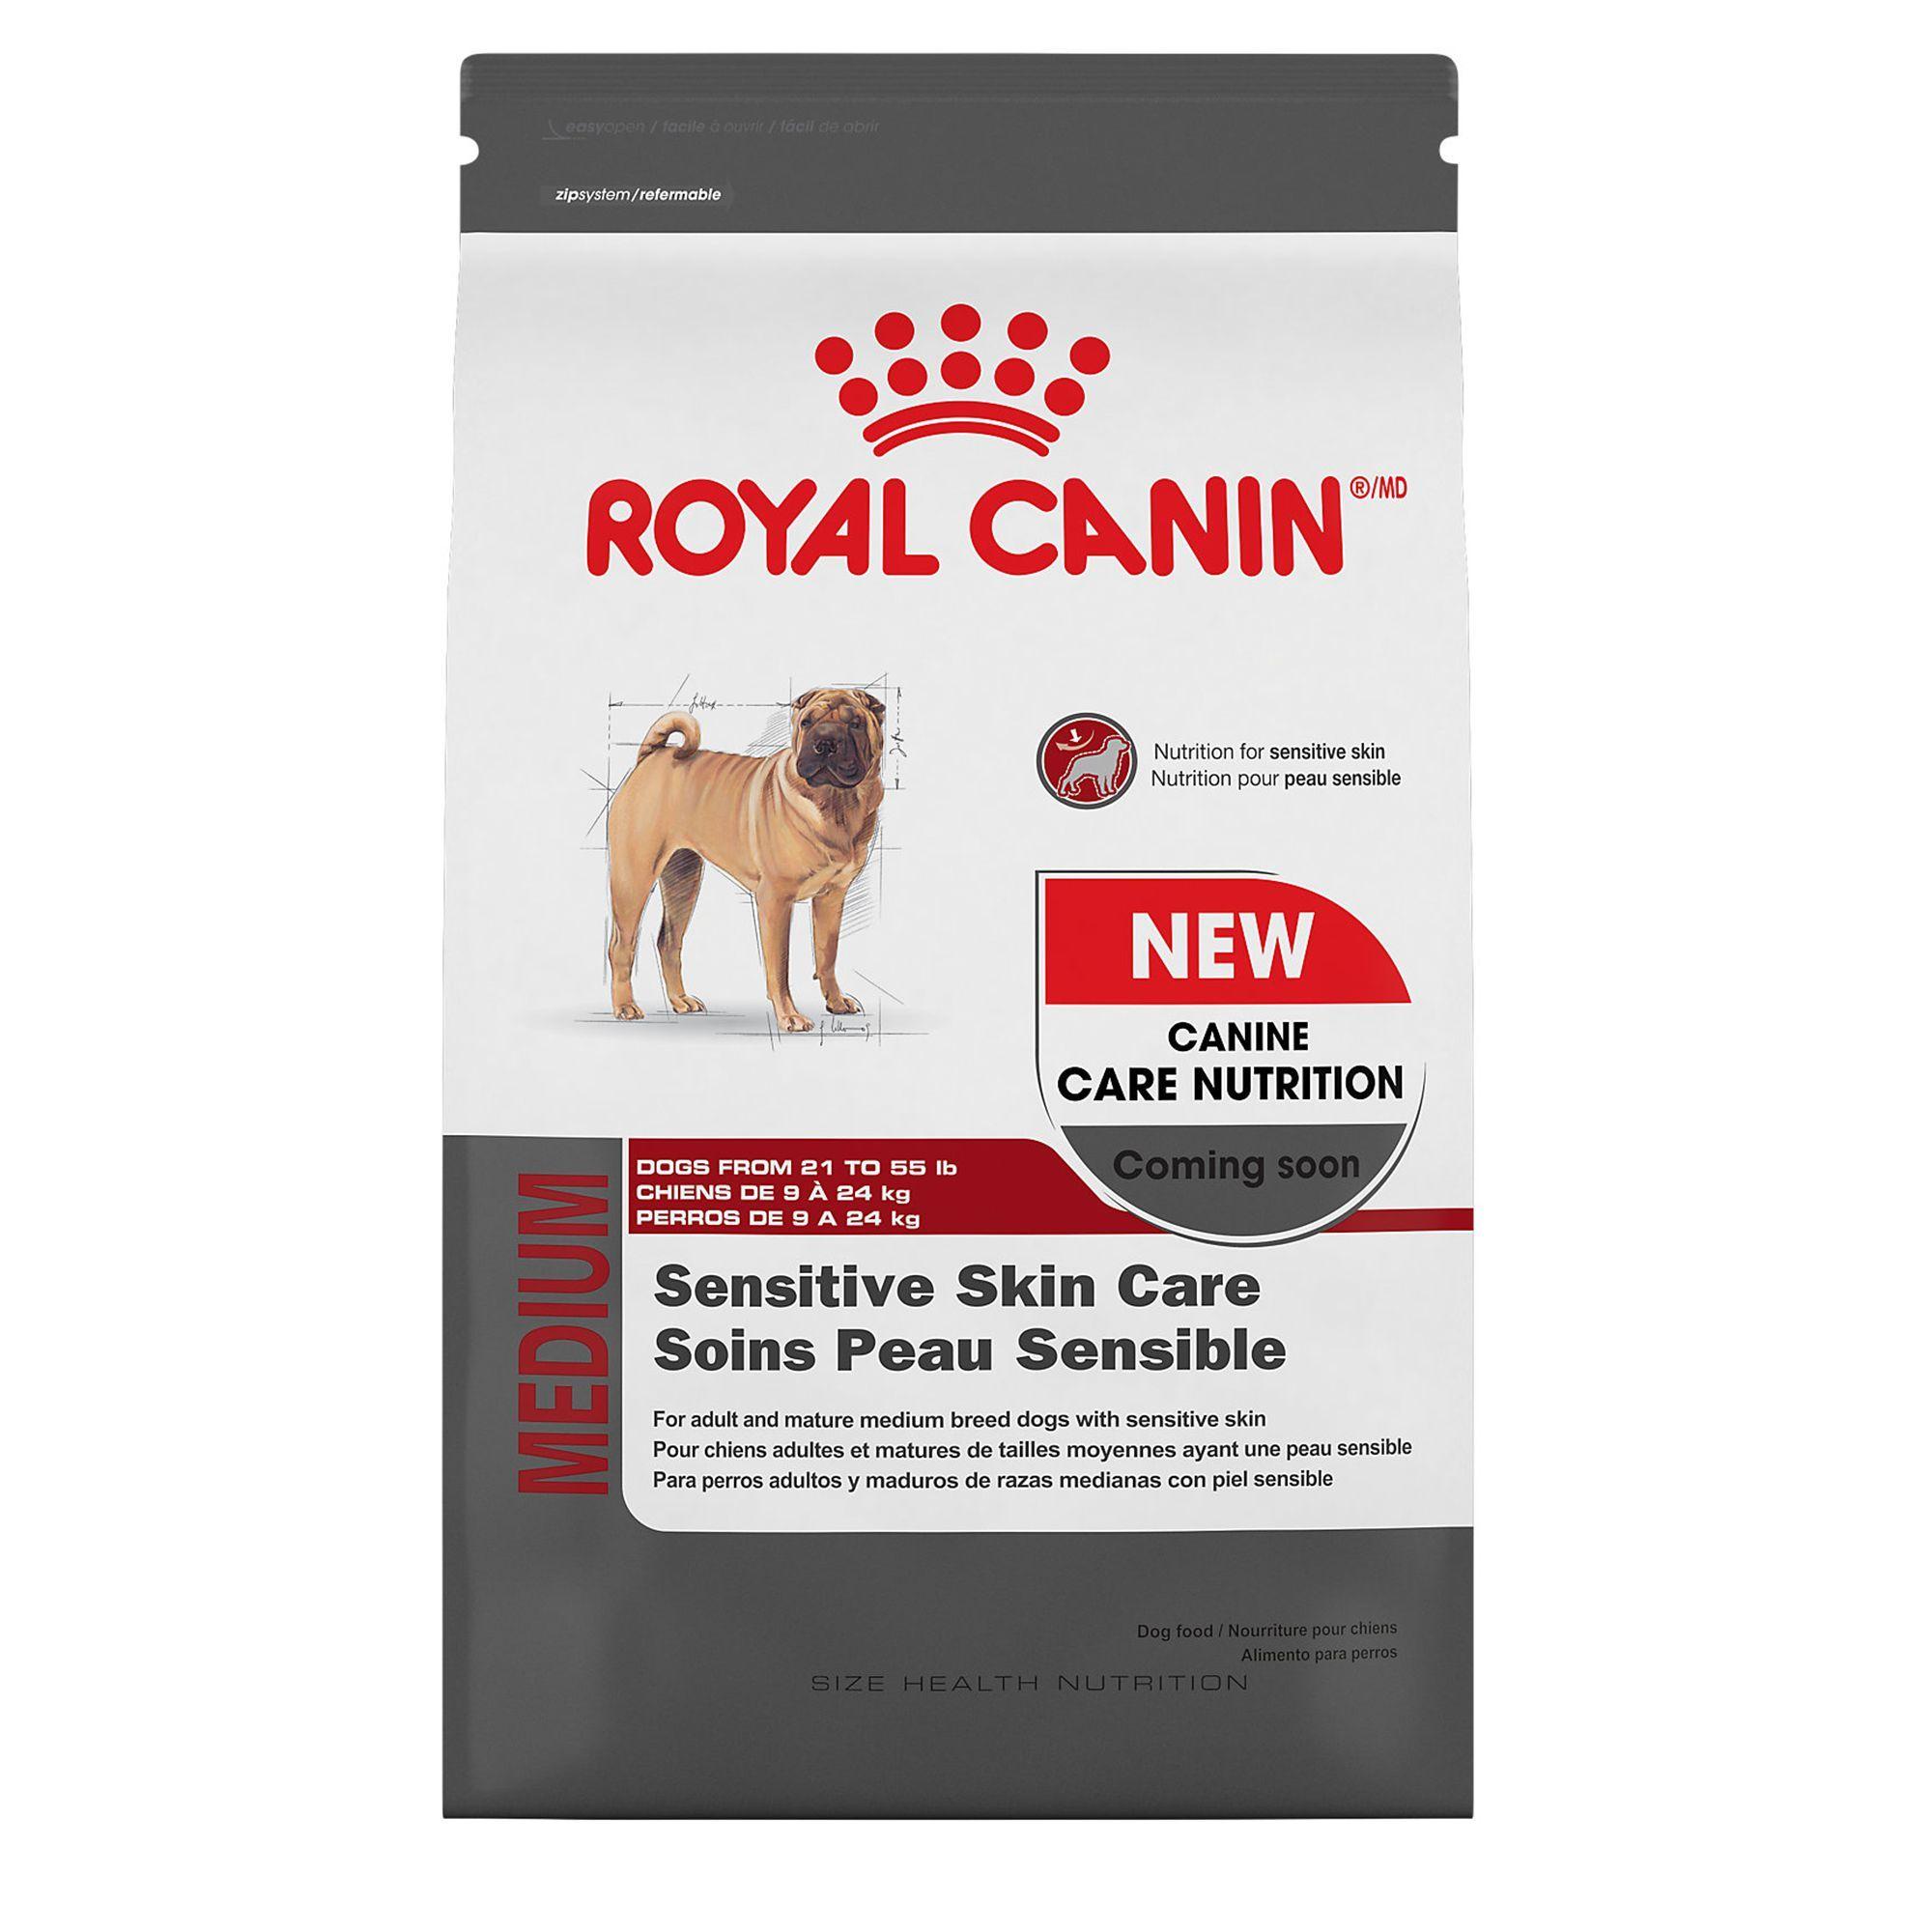 Royal Canin Size Health Nutrition Sensitive Skin Care Medium Dog Food Size Sensitive Skin Care Sensitive Skin Skin Nutrition